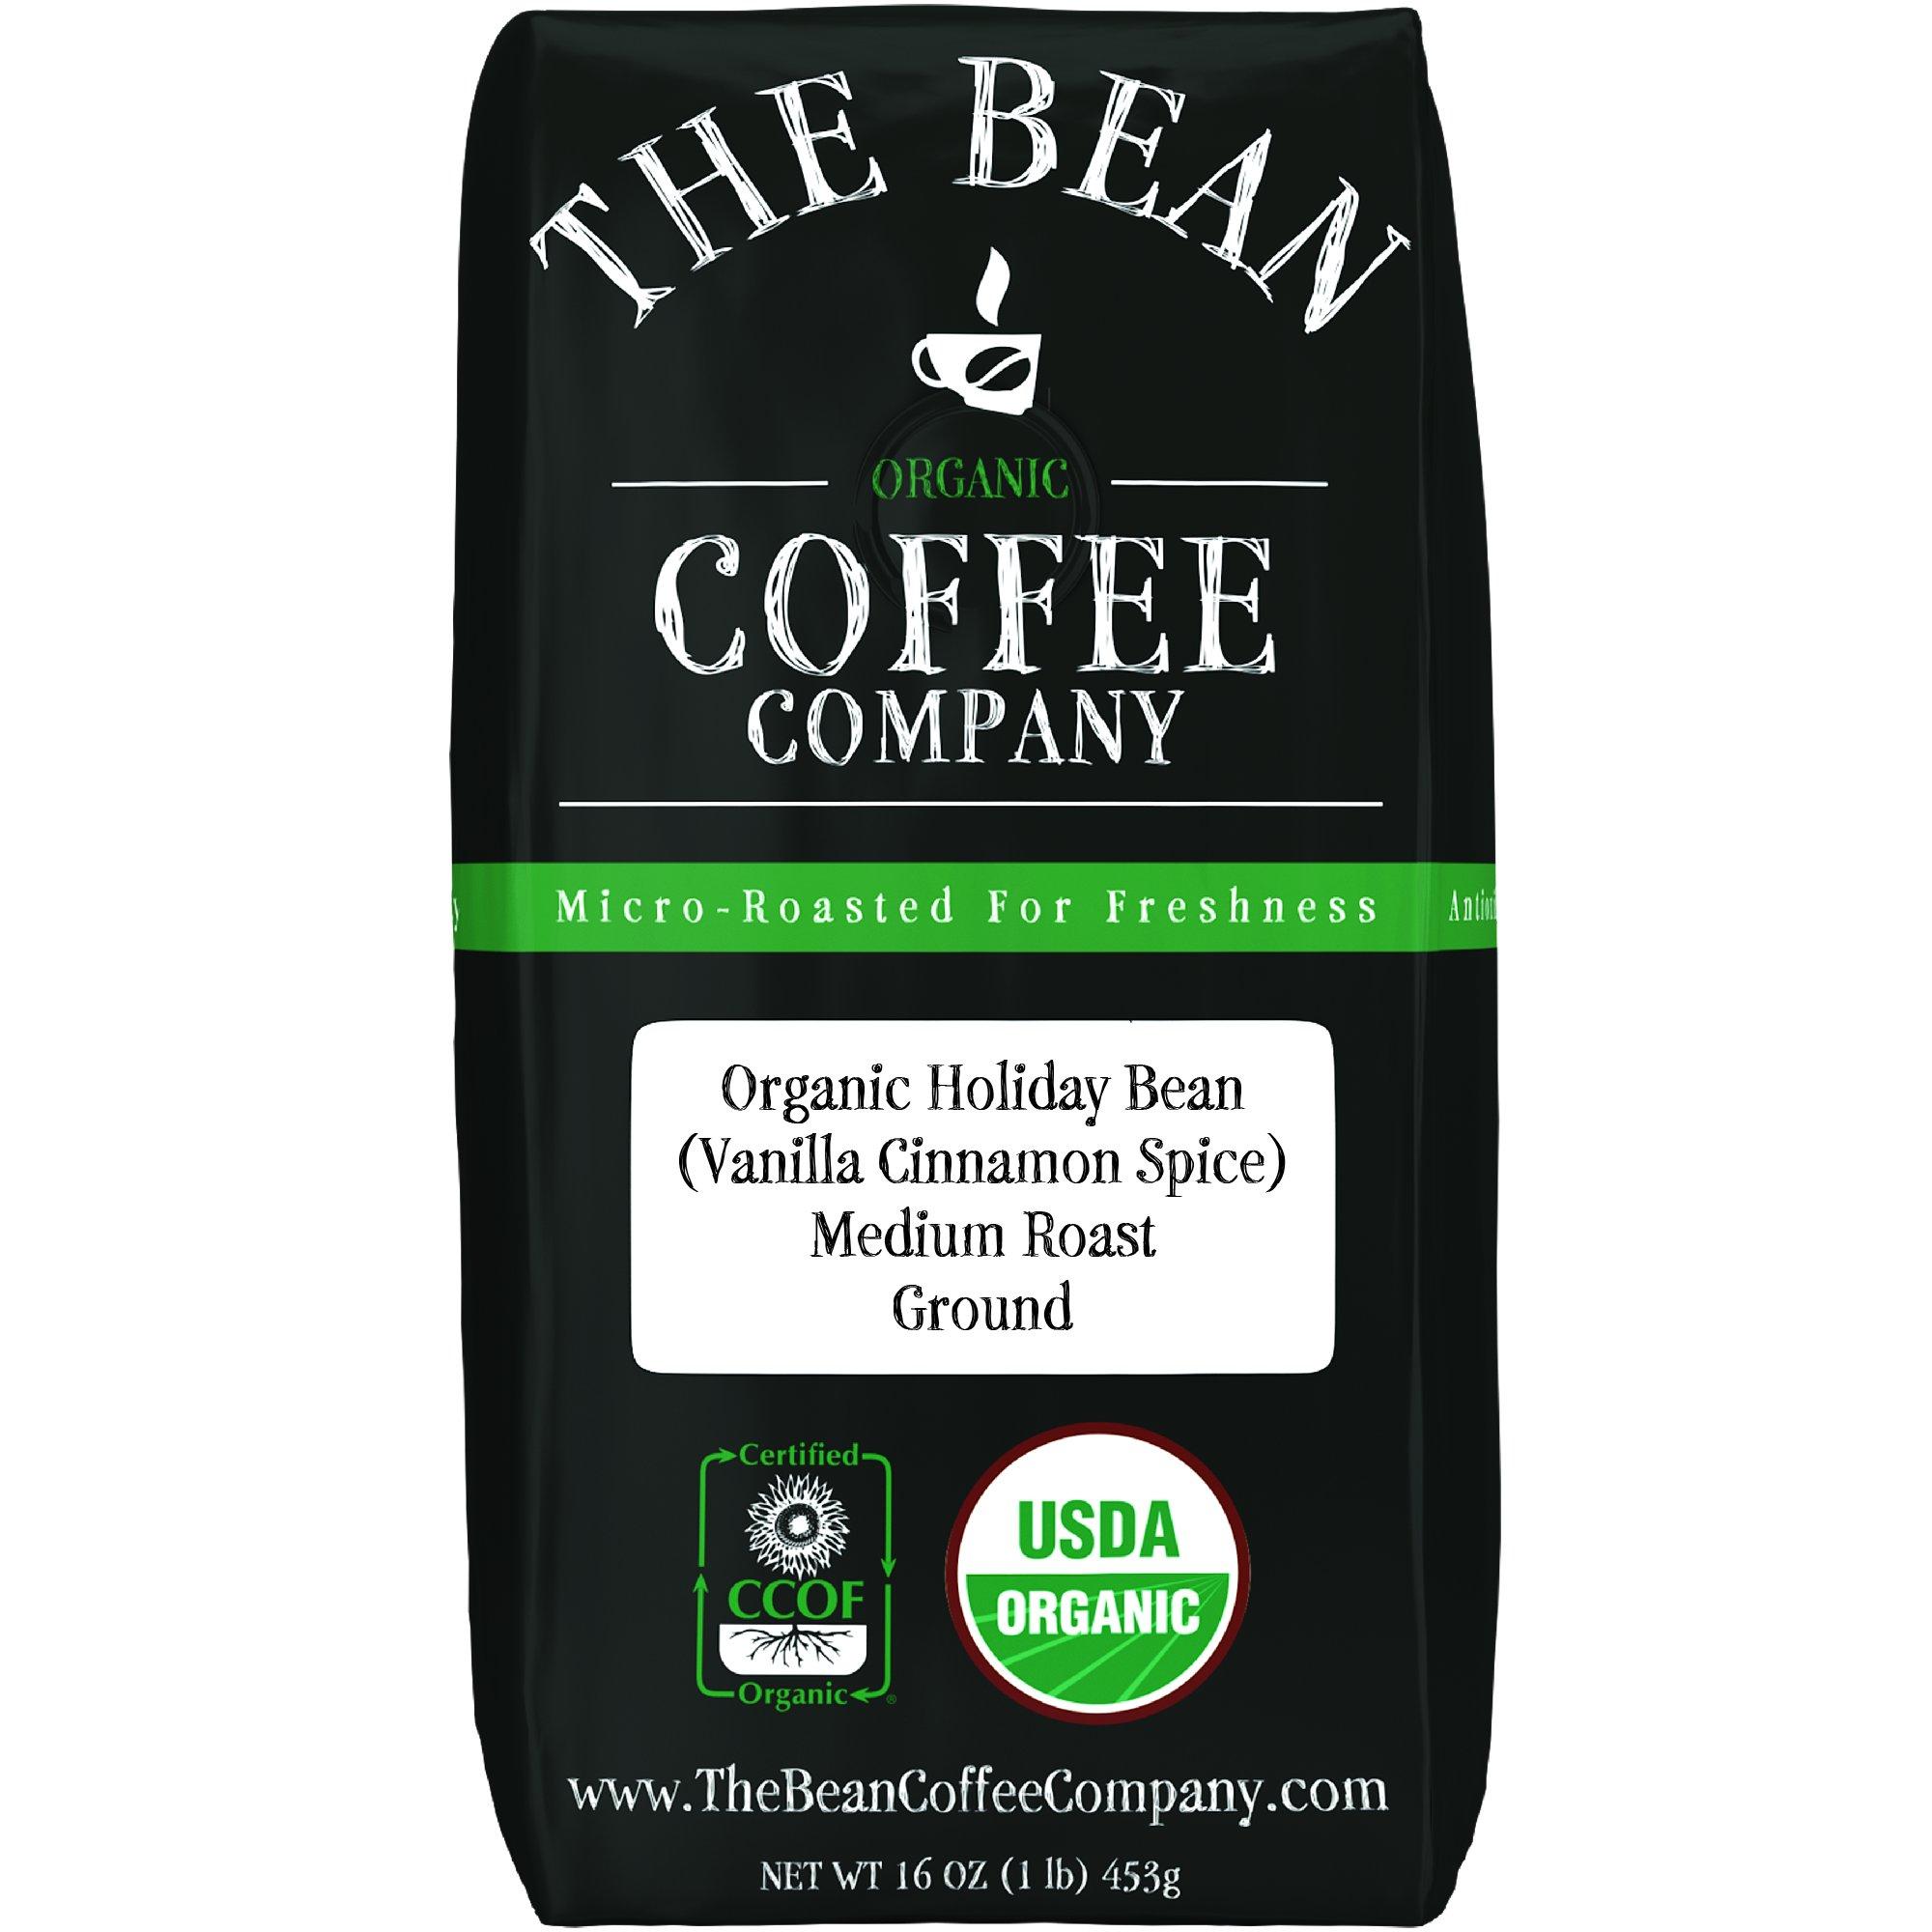 The Bean Coffee Company Organic Mocha Java, Medium Roast, Whole Bean, 5-Pound Bag $25.56 fs w/S&S @15% (on 5 or more S&S items) @ amazon